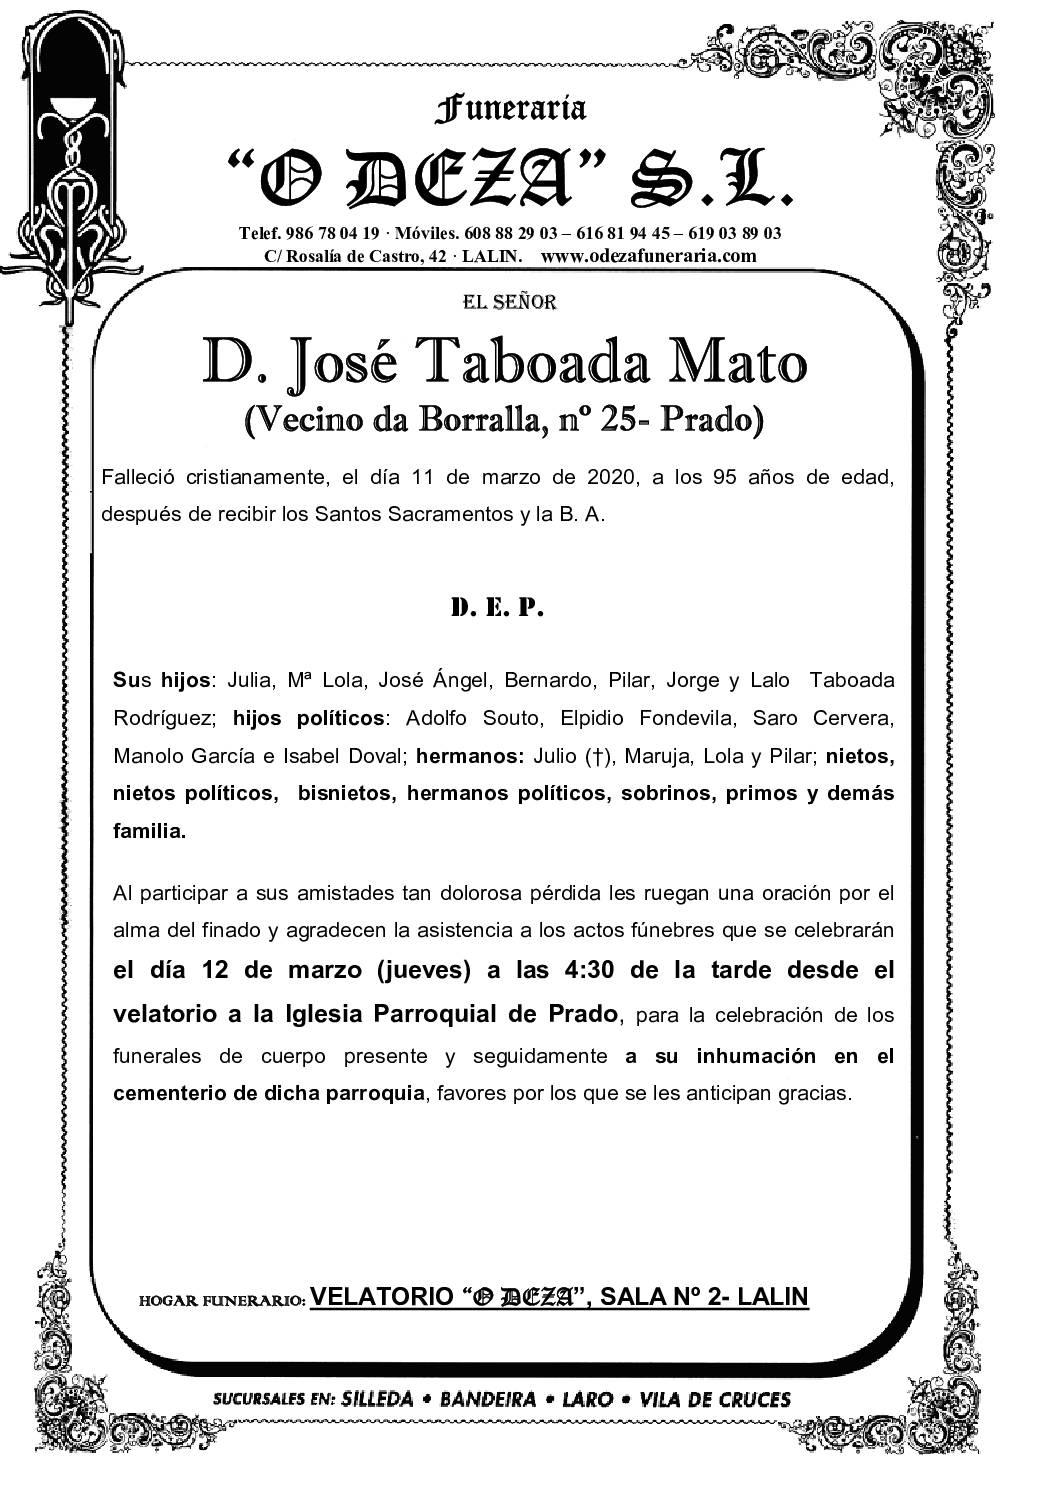 D. JOSÉ TABOADA MATO